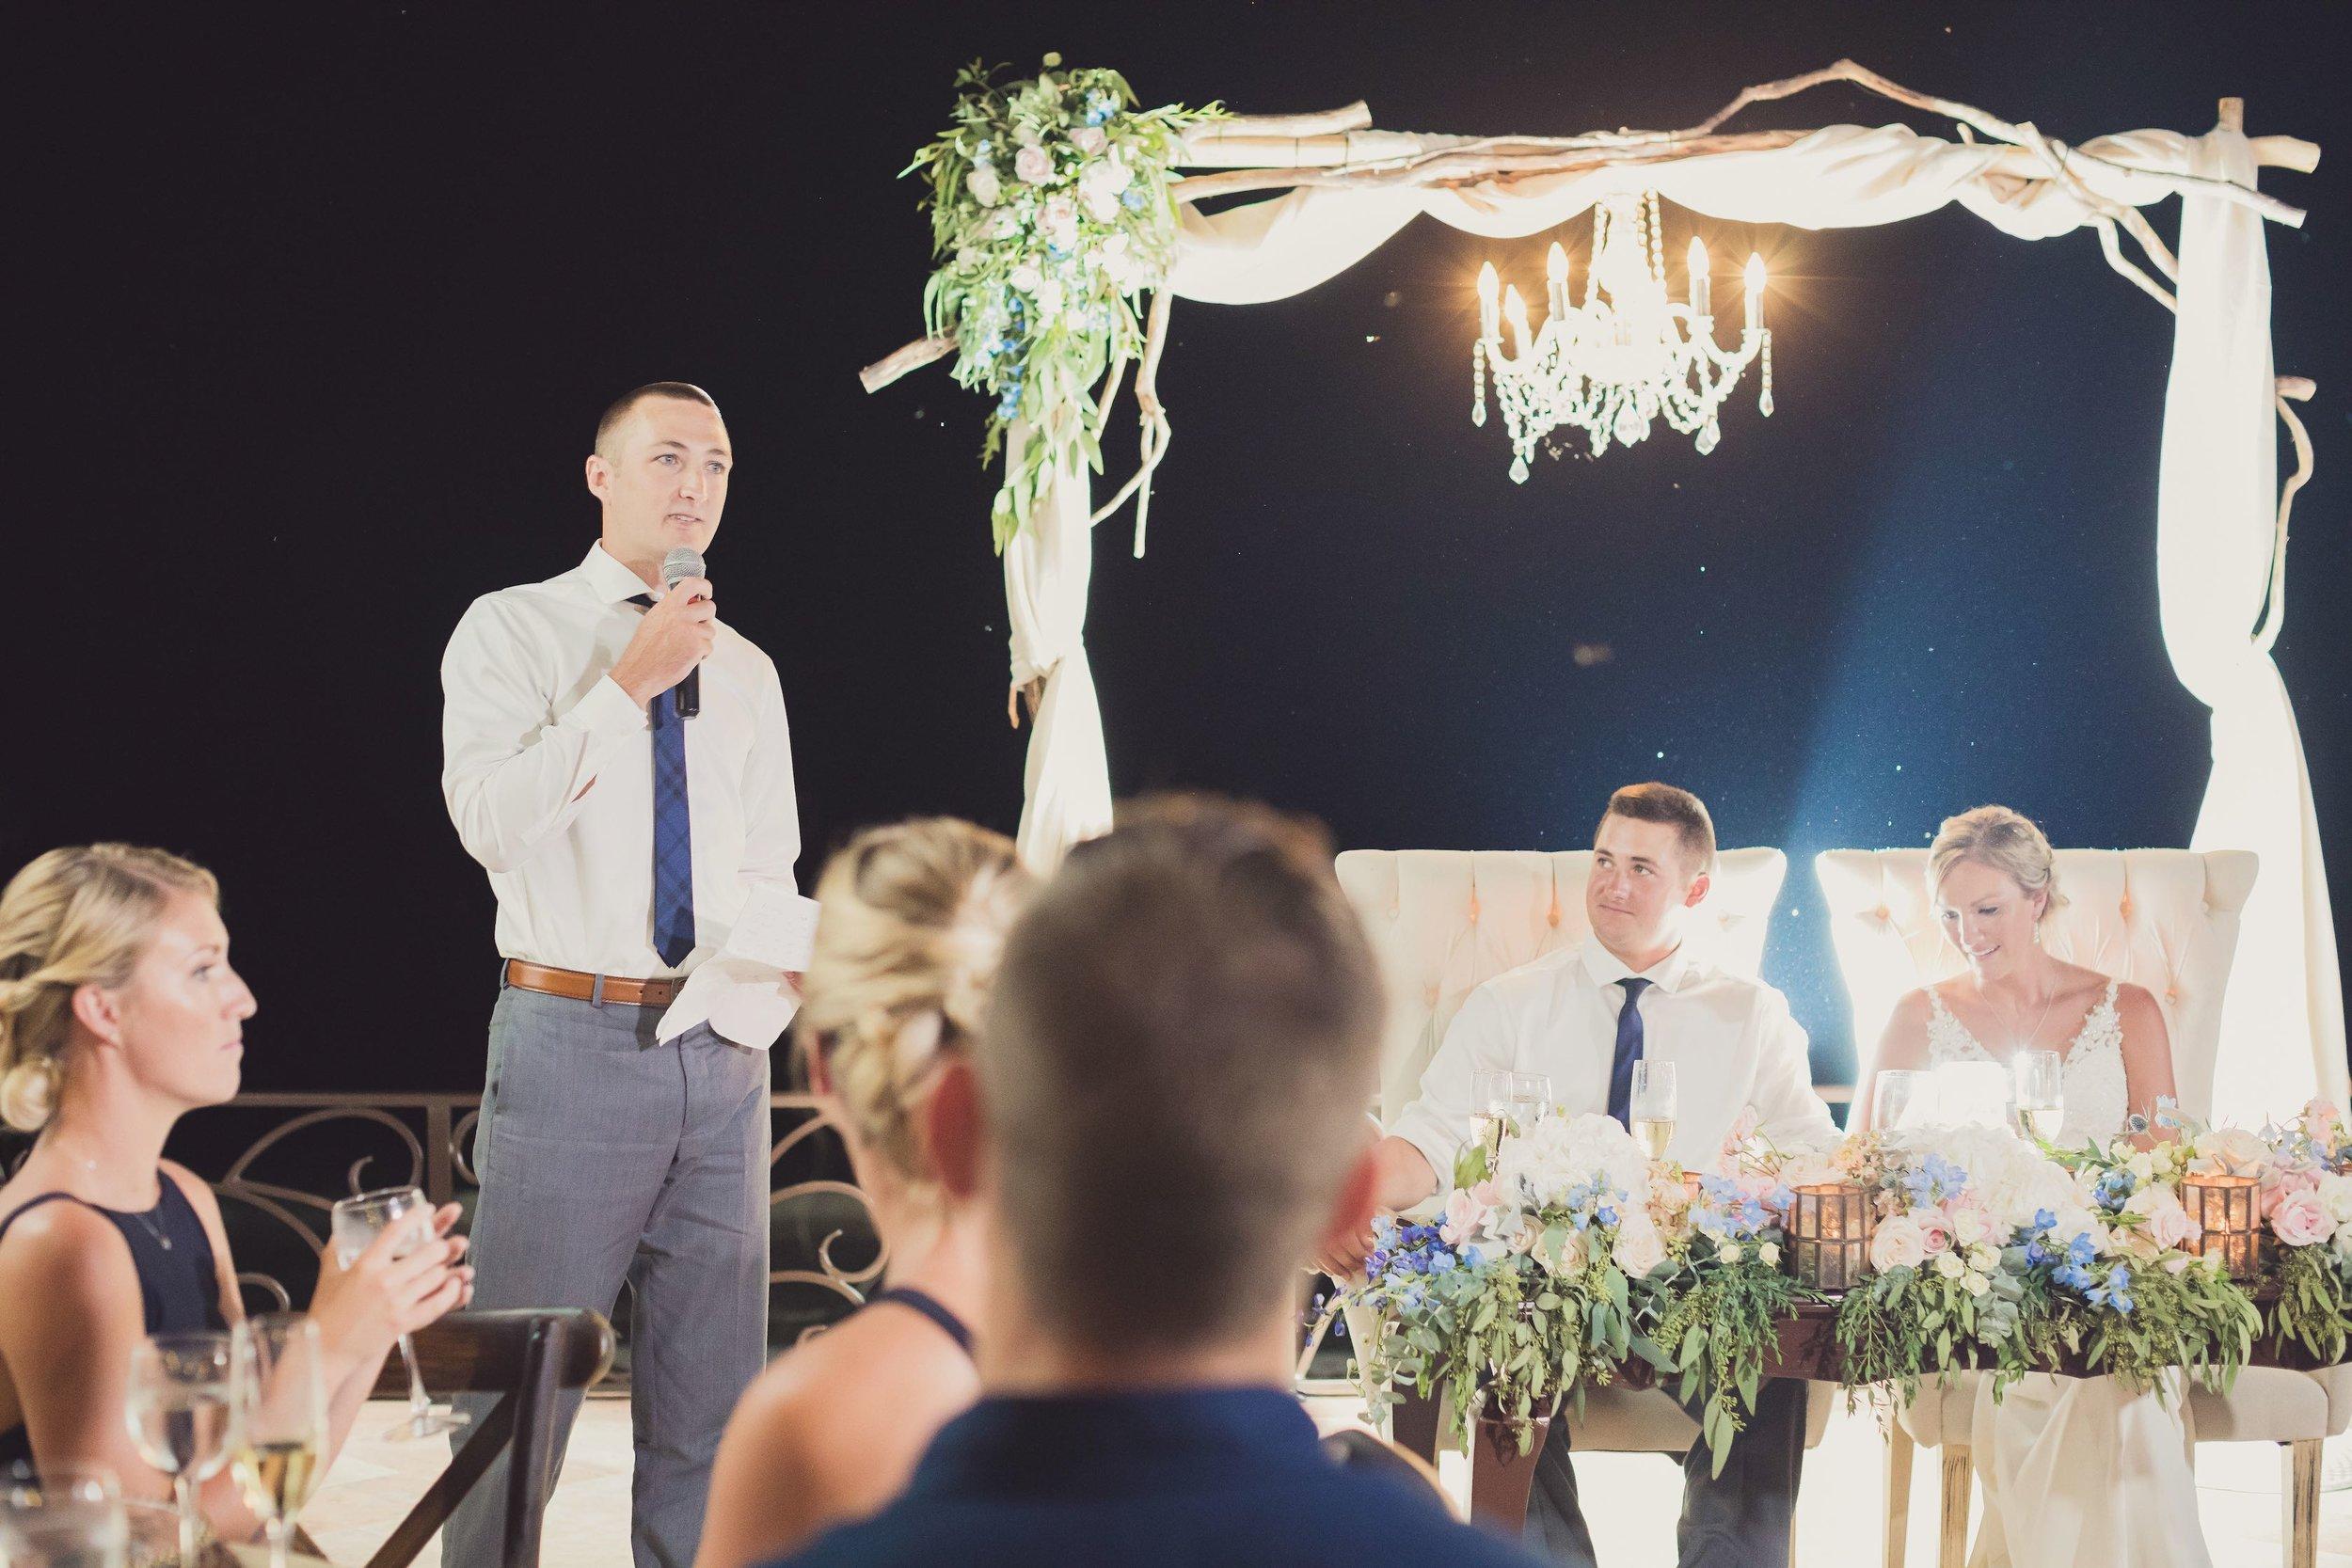 cancun-wedding-venue-villa-la-joya-971 copy-websize.jpg